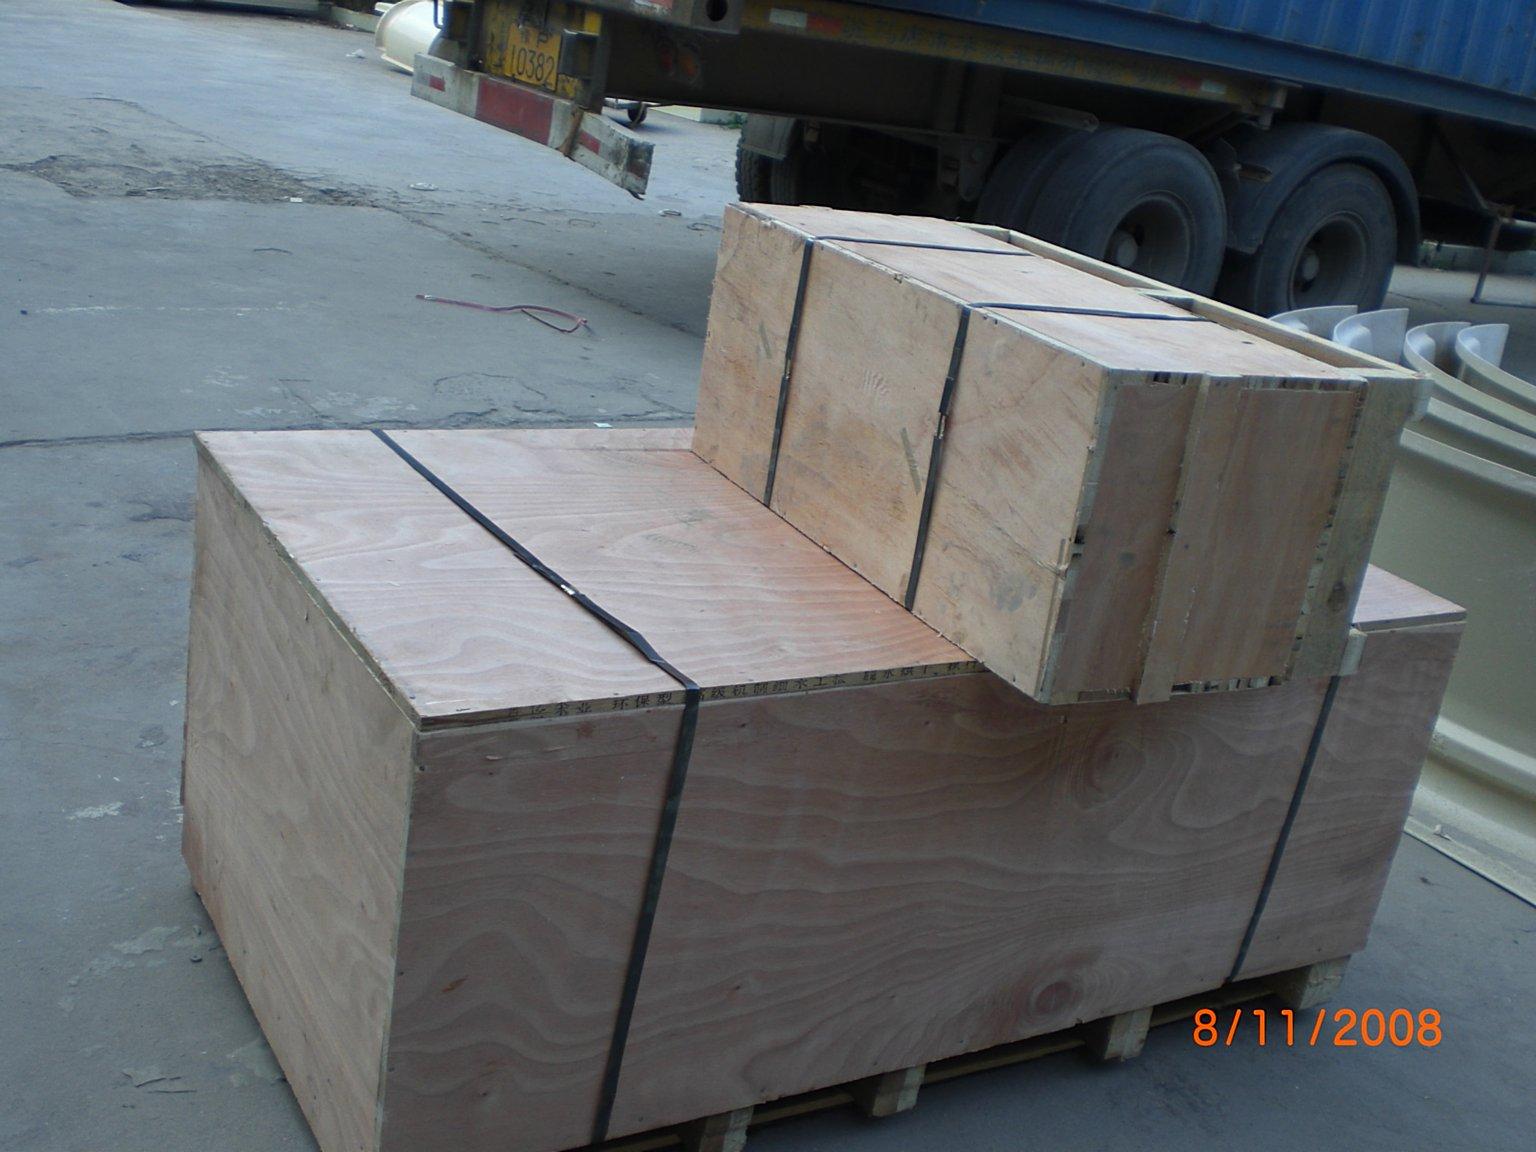 Shipmets 0G